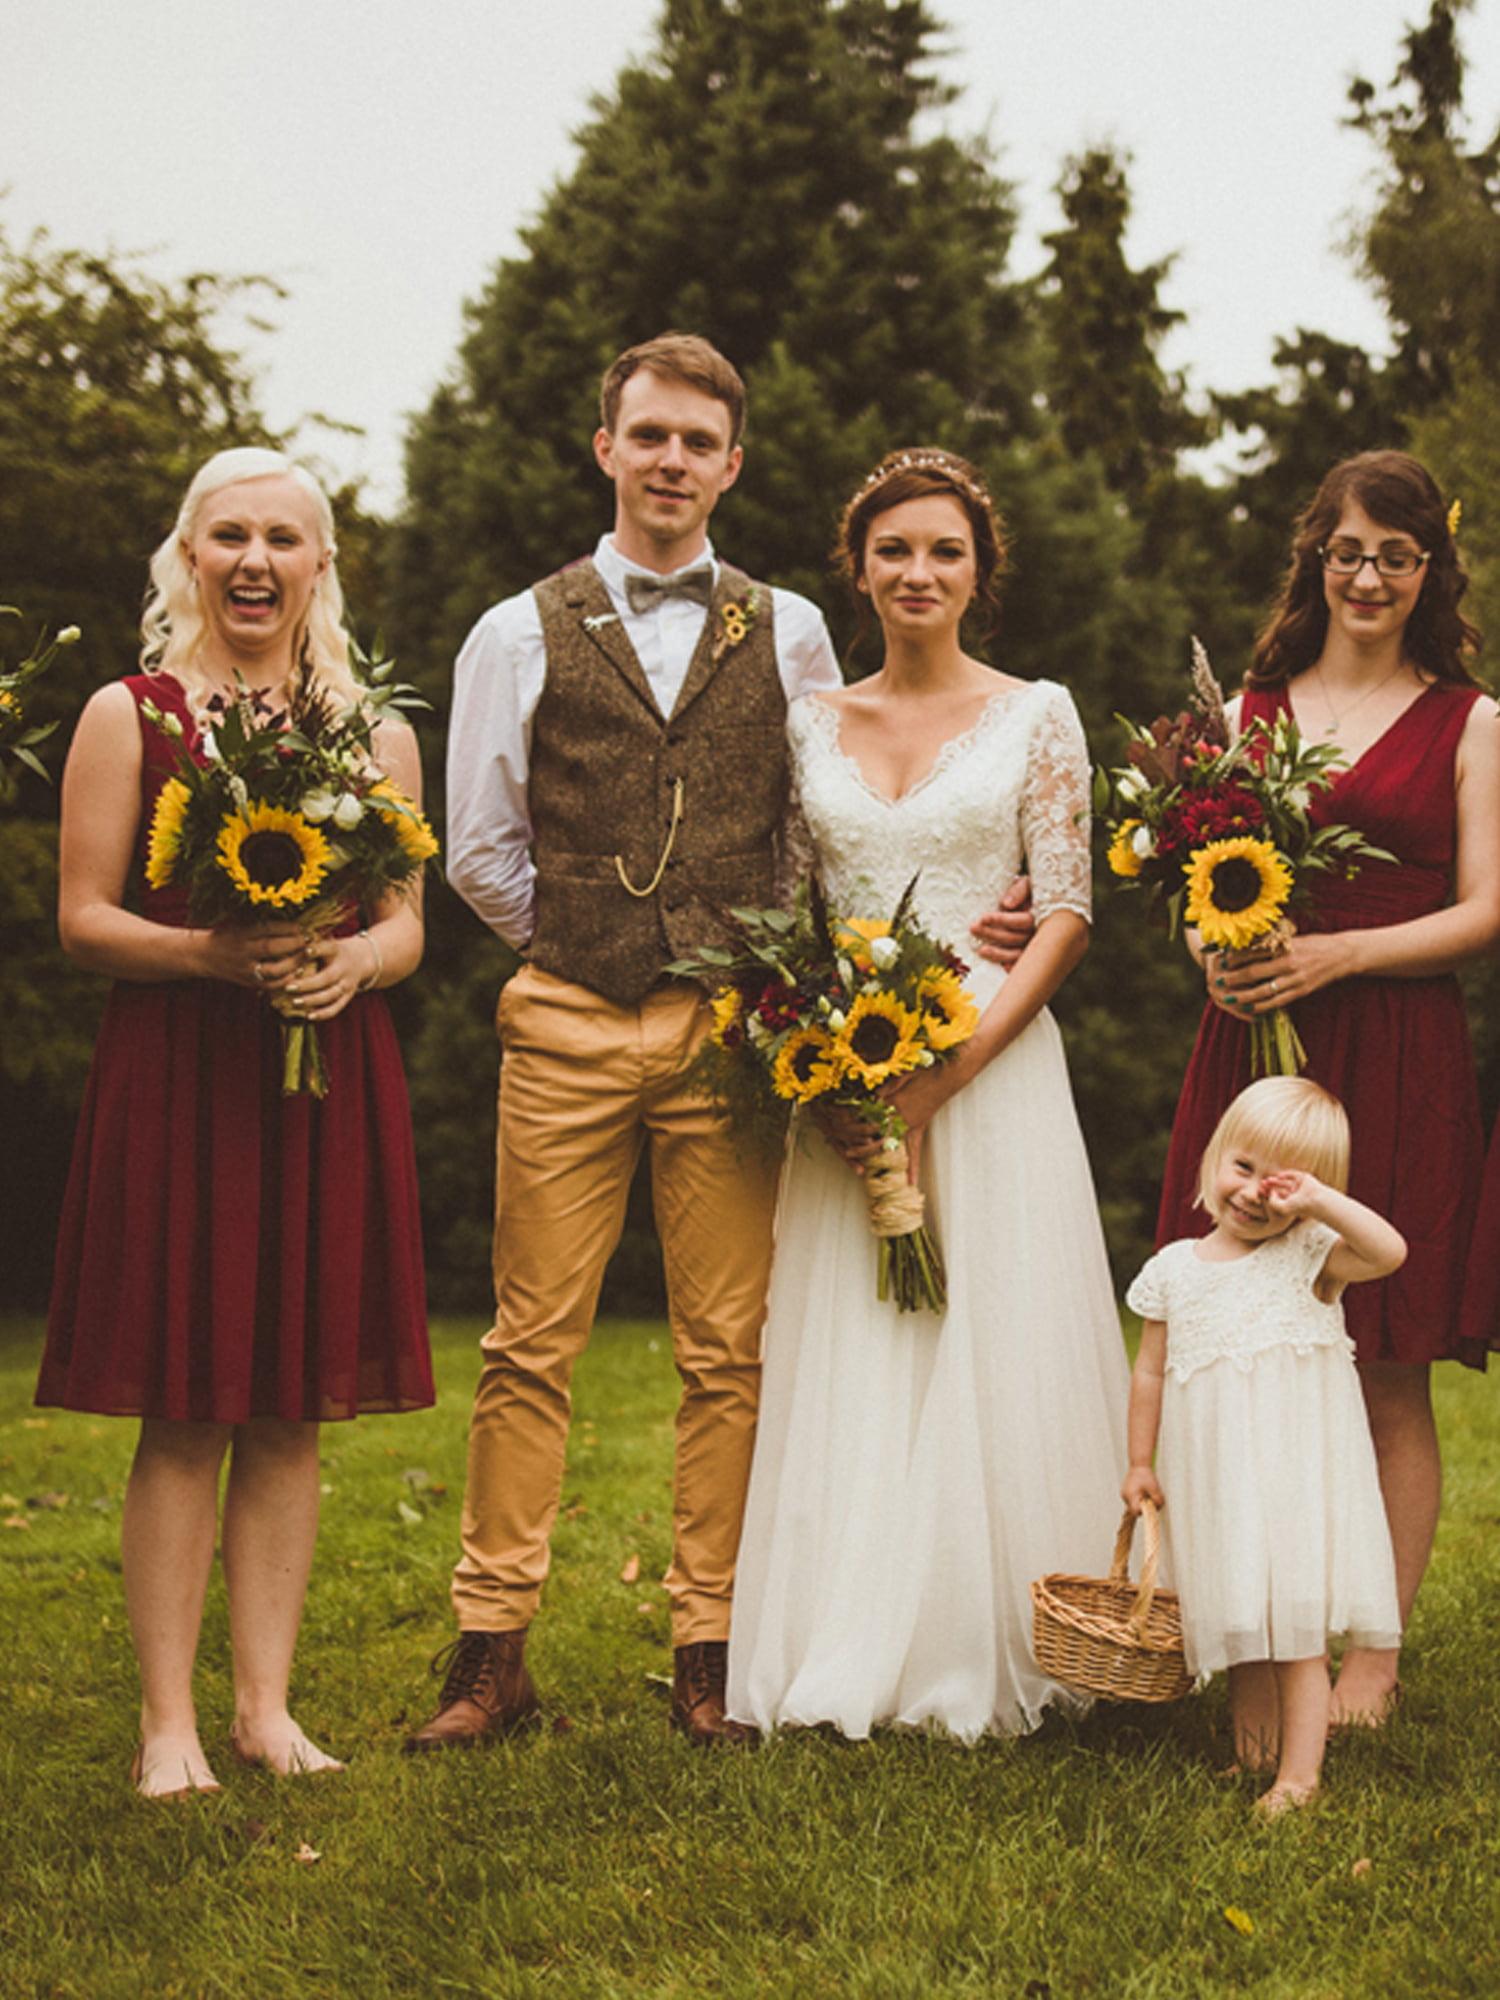 Ever-Pretty Women's Chiffon V-Neck Short Bridesmaid Wedding Party Formal Evening Dresses for Women 03989 Burgundy US 4